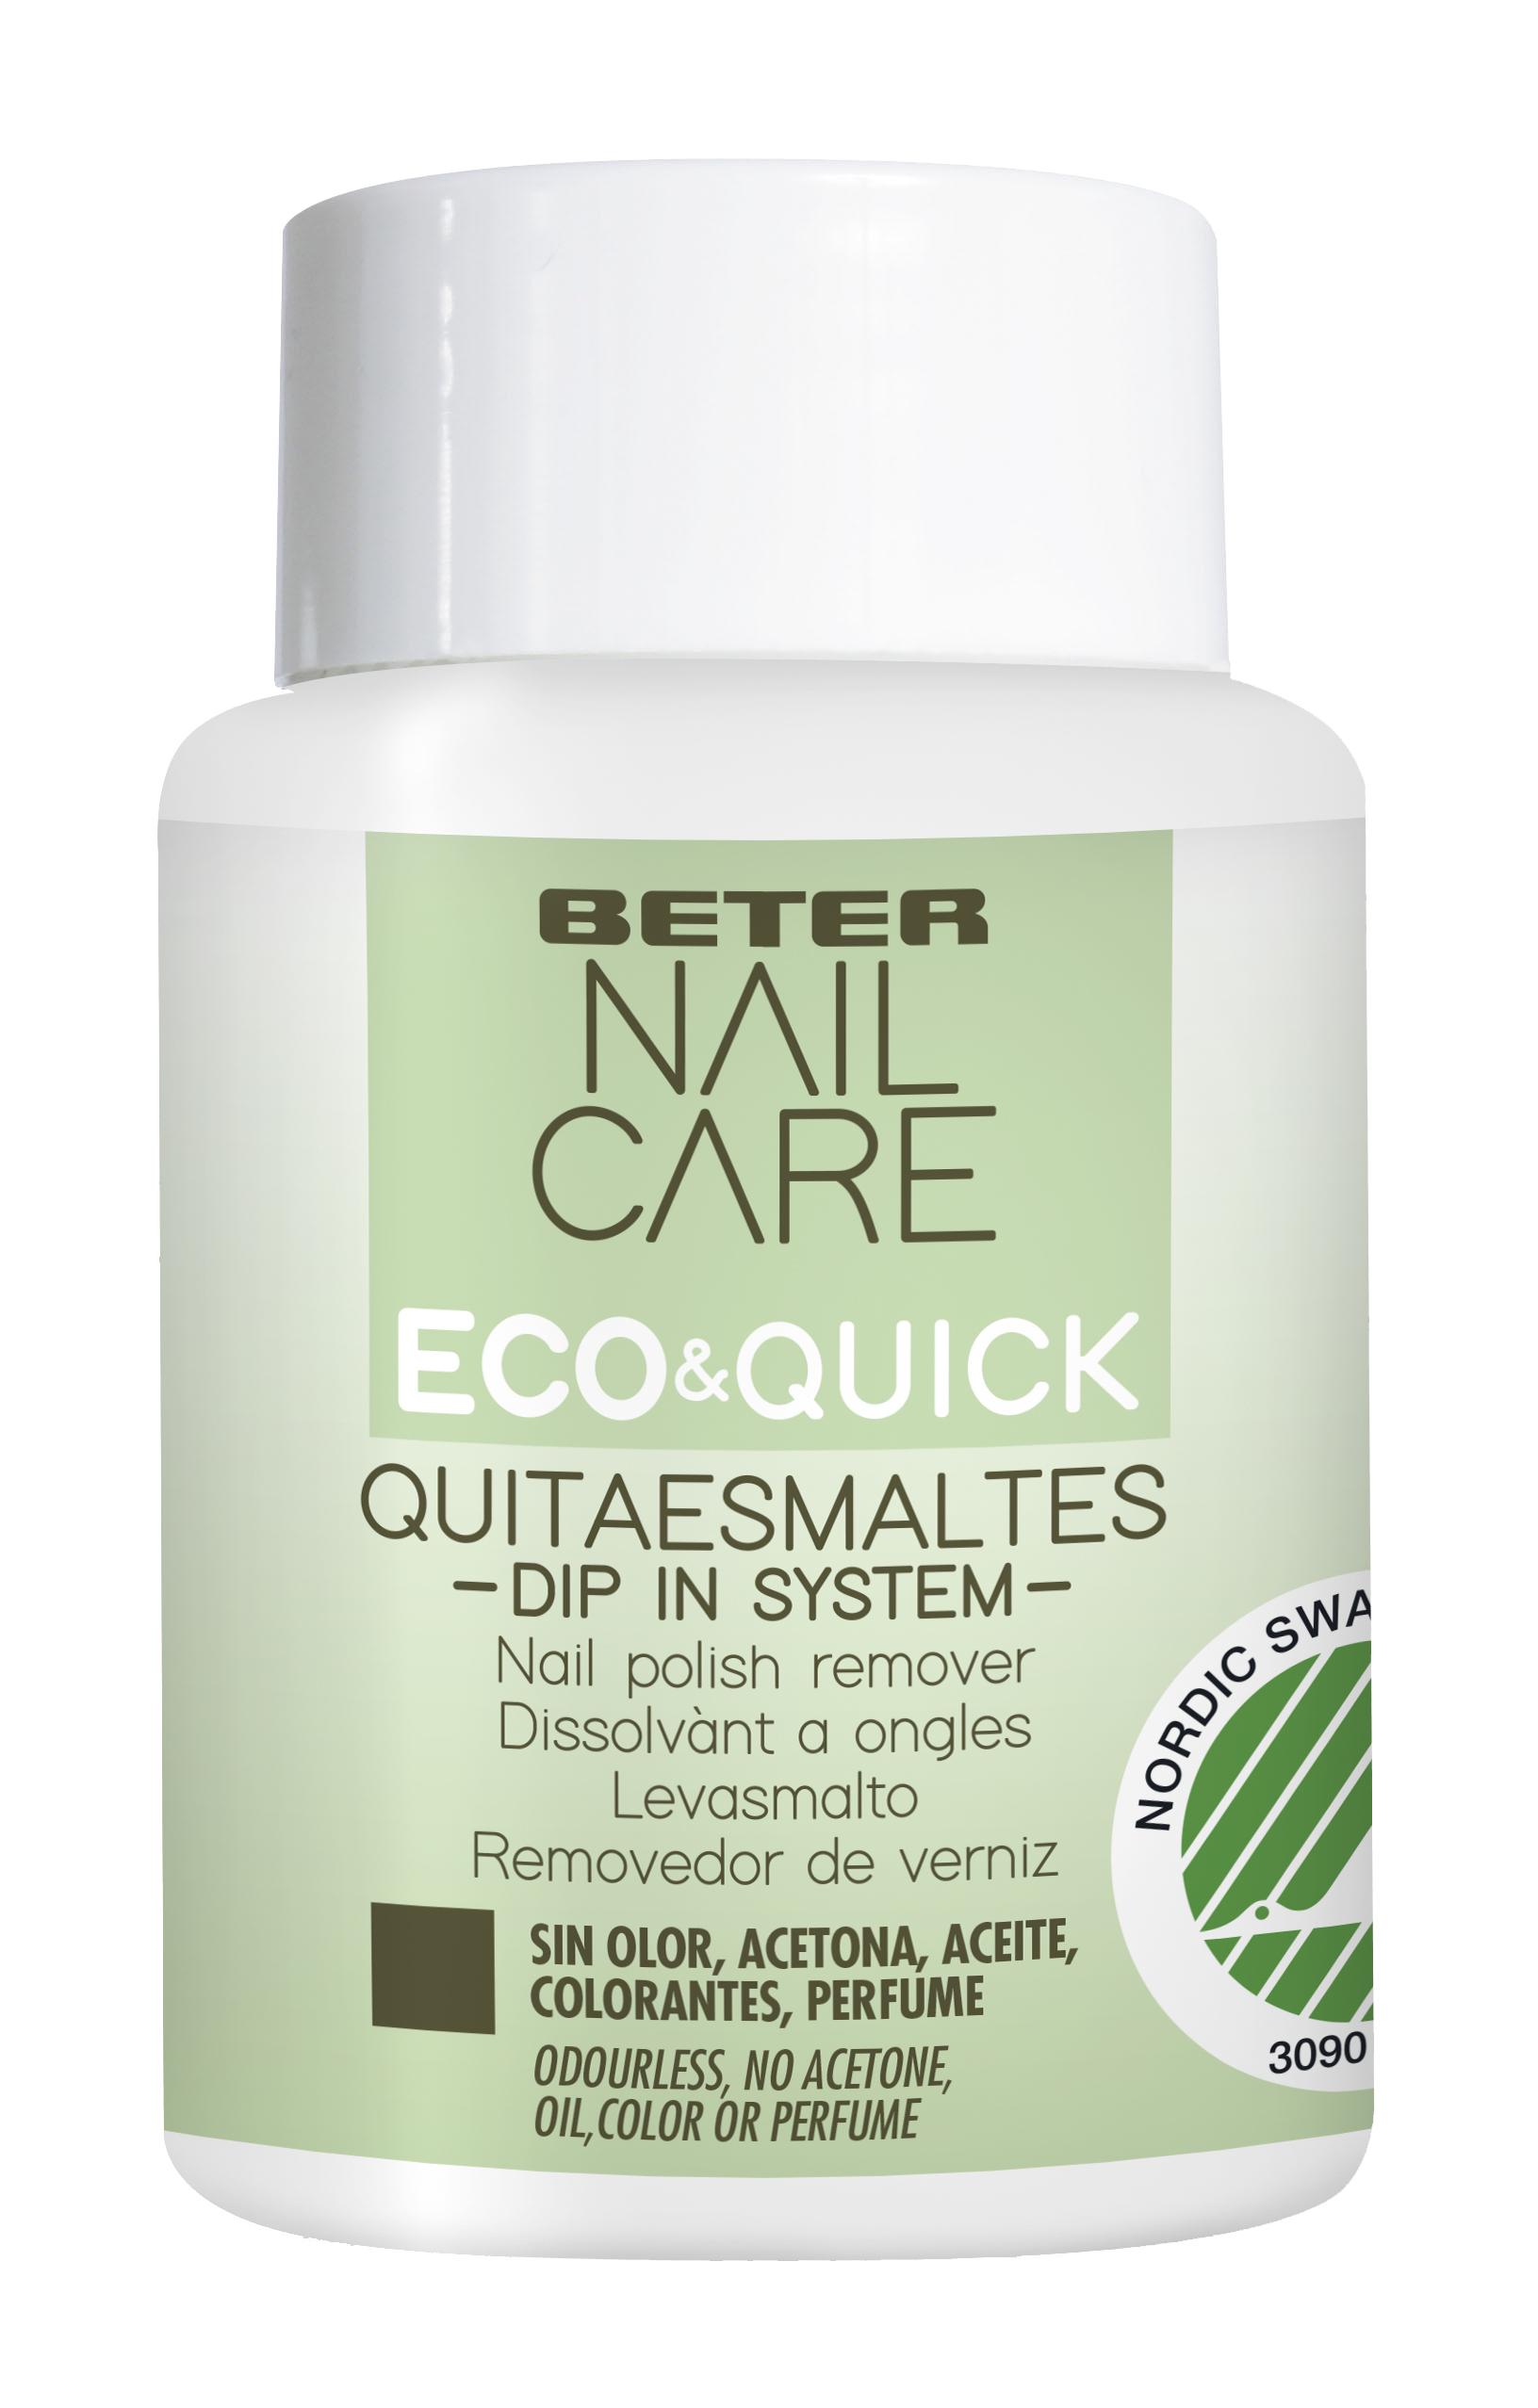 Quitaesmaltes Eco-Quick Dip In System, de Beter (8,95 euros). Sin acetona, aceites, colorantes o perfumes.